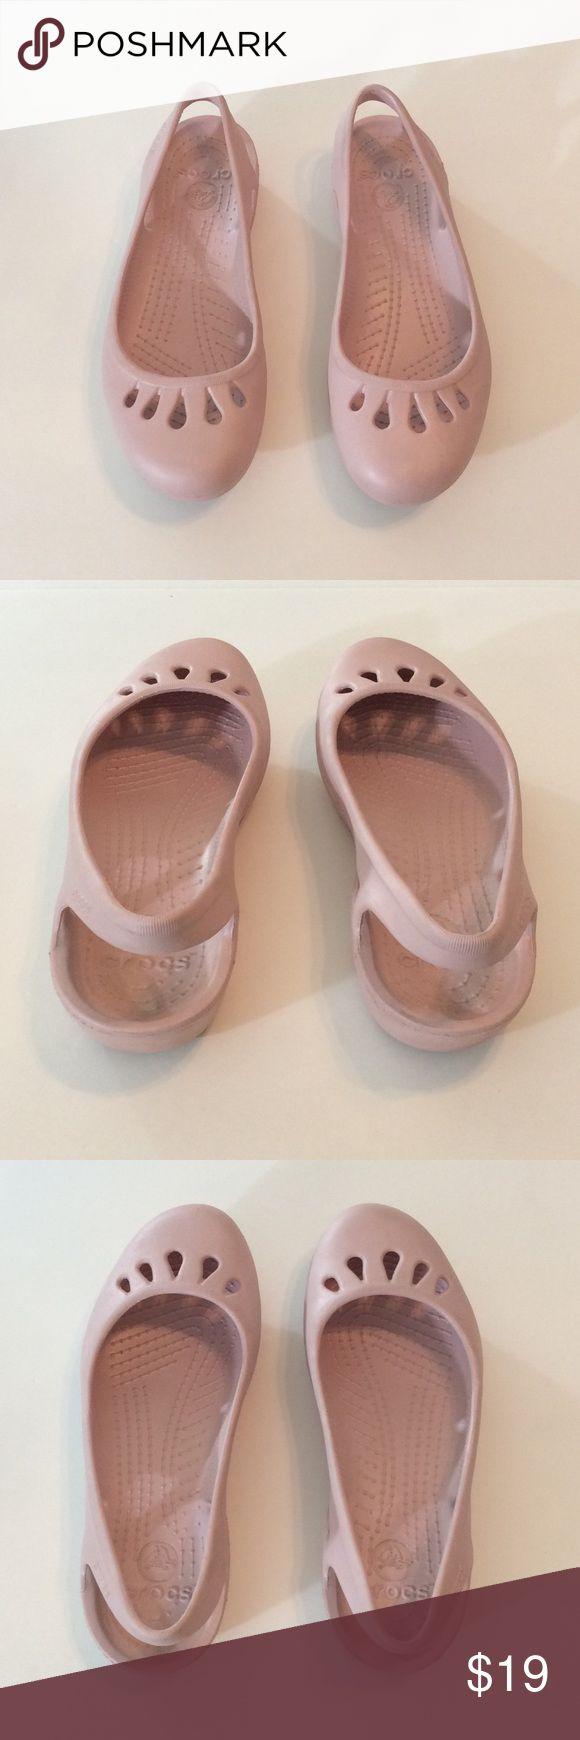 Labor Day Sale  Adorable Crocs | Size 9 Excellent condition. Comfortable to wear. CROCS Shoes Flats & Loafers